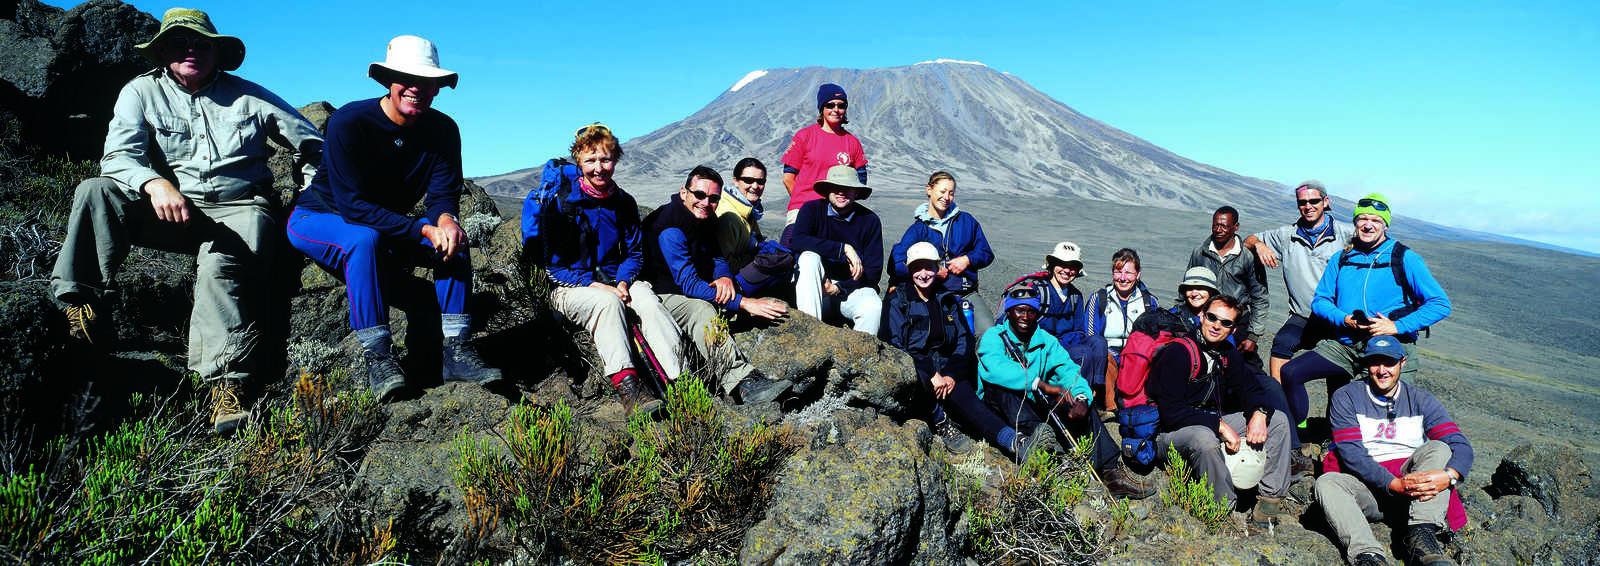 Group near the Saddle on Kilimanjaro, Tanzania